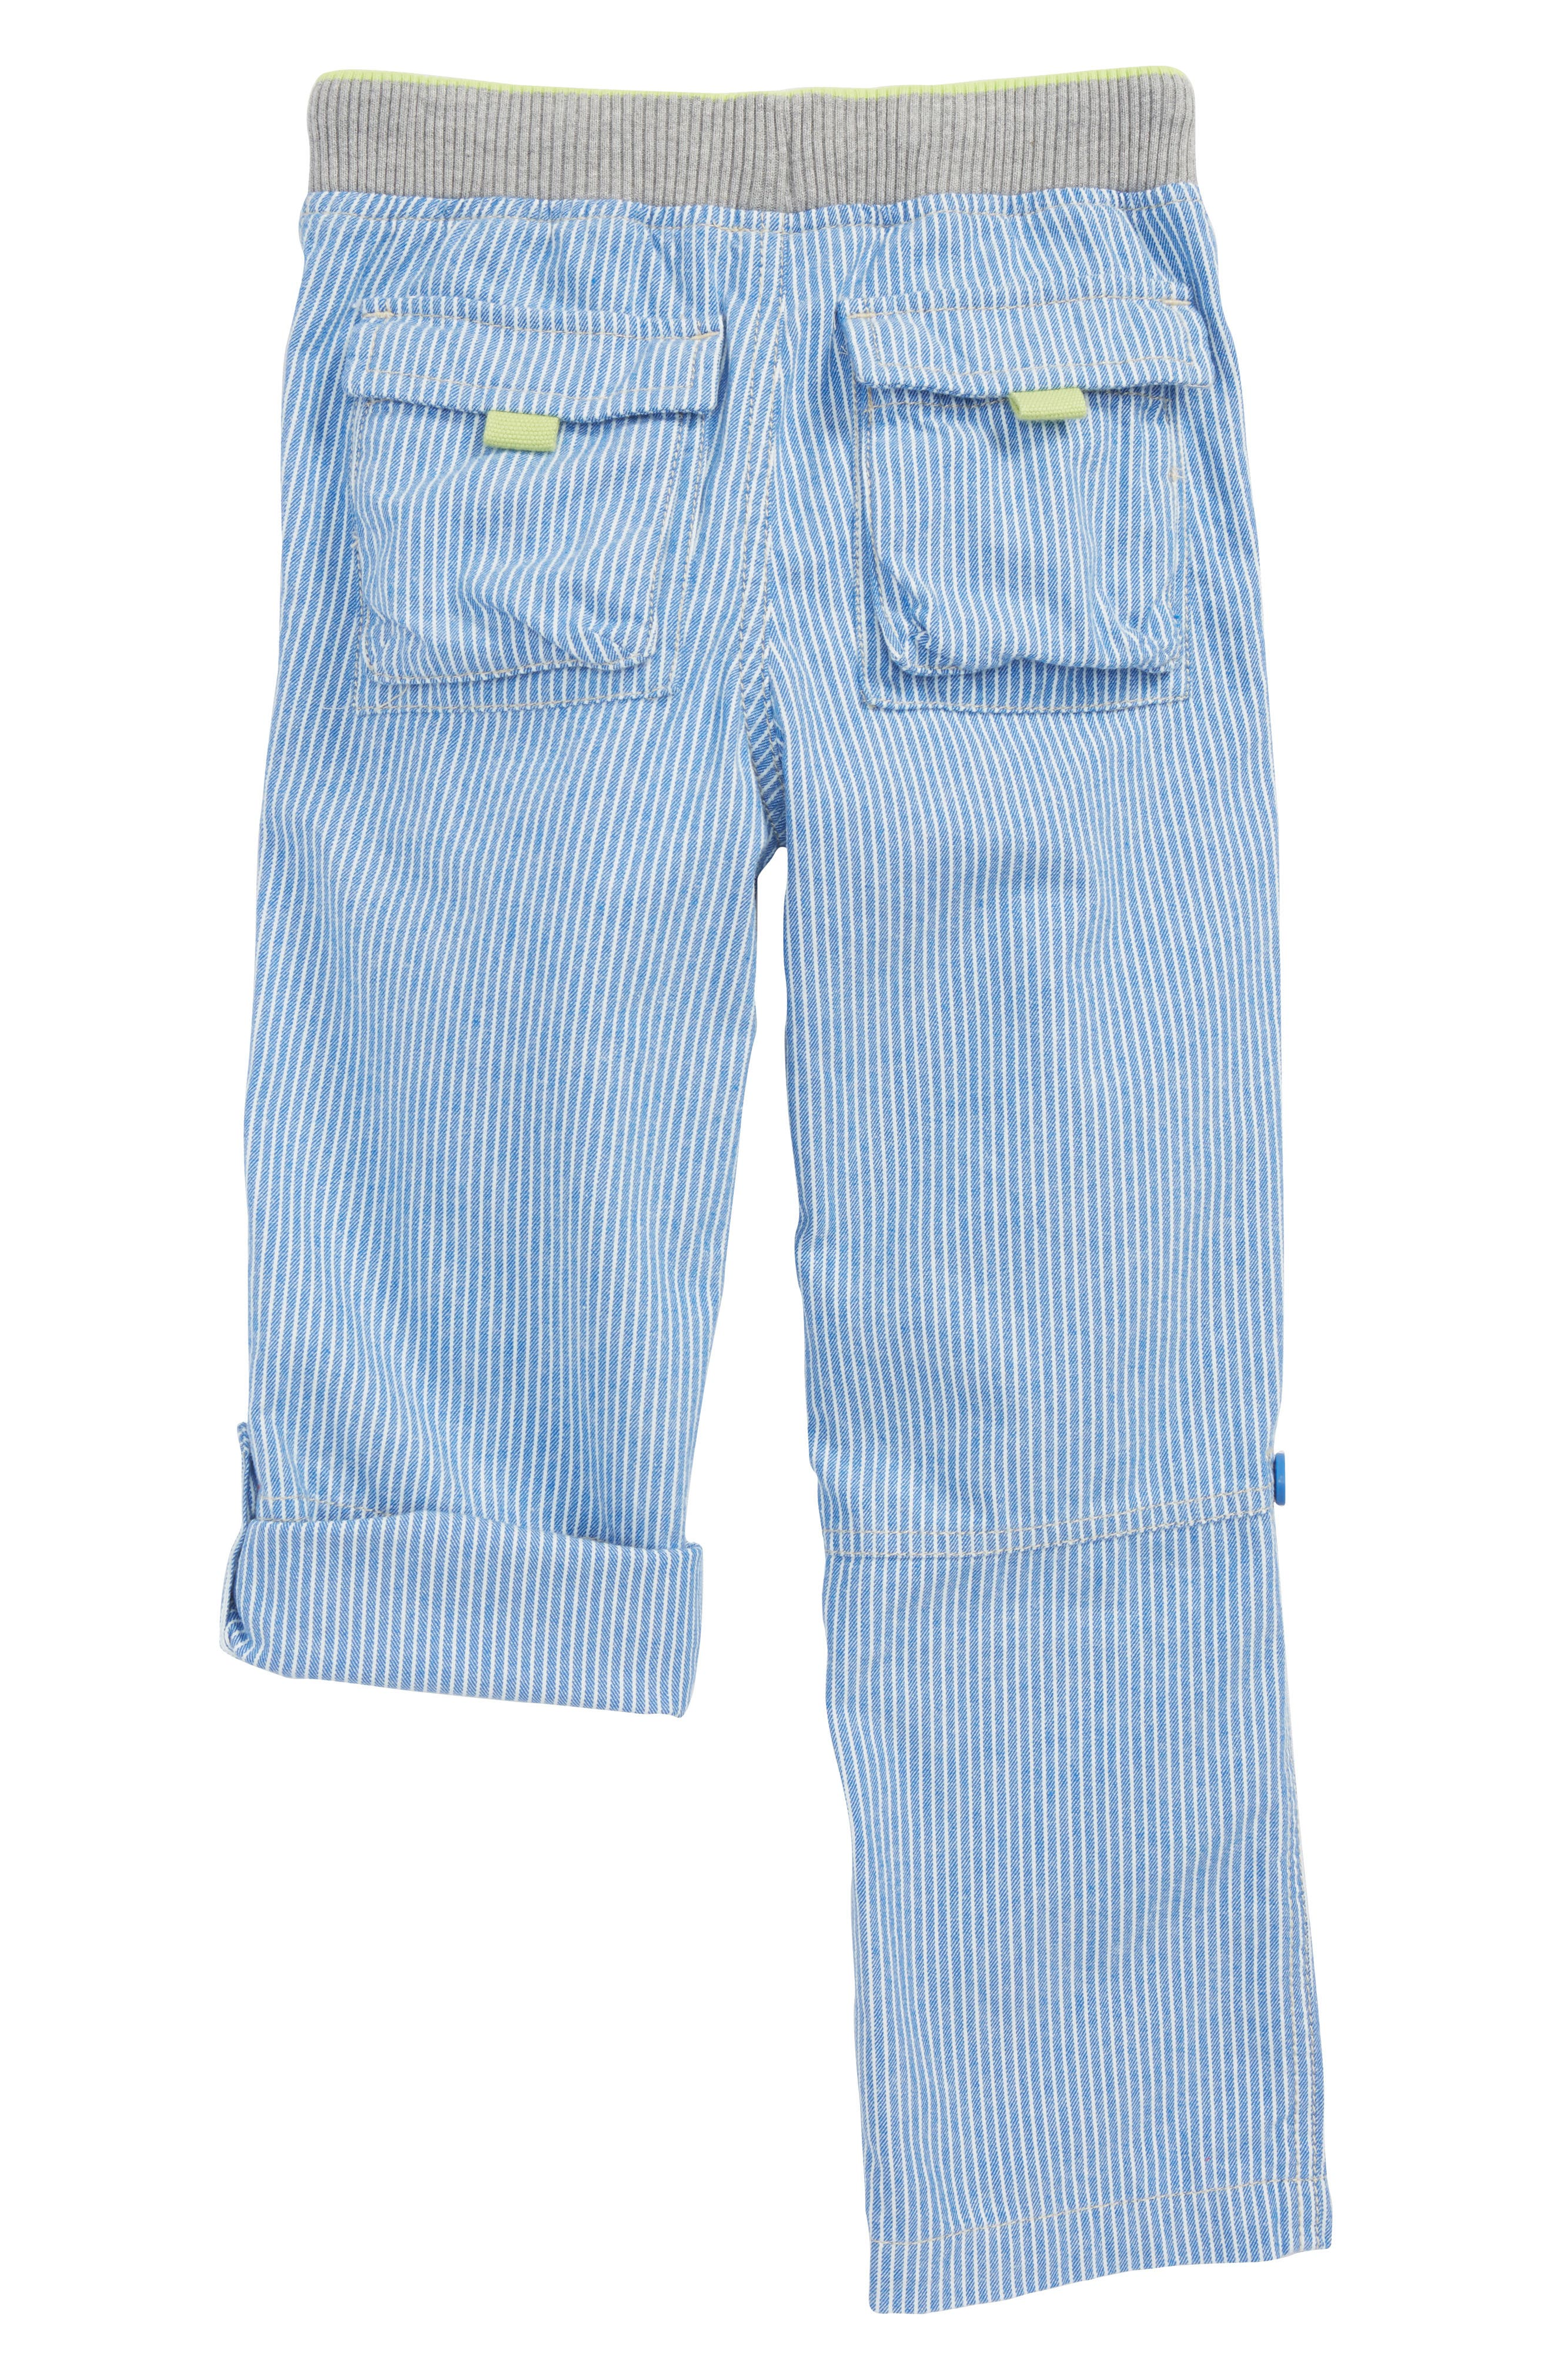 Surf Roll-Up Pants,                             Alternate thumbnail 2, color,                             Skipper Blue/ Ecru